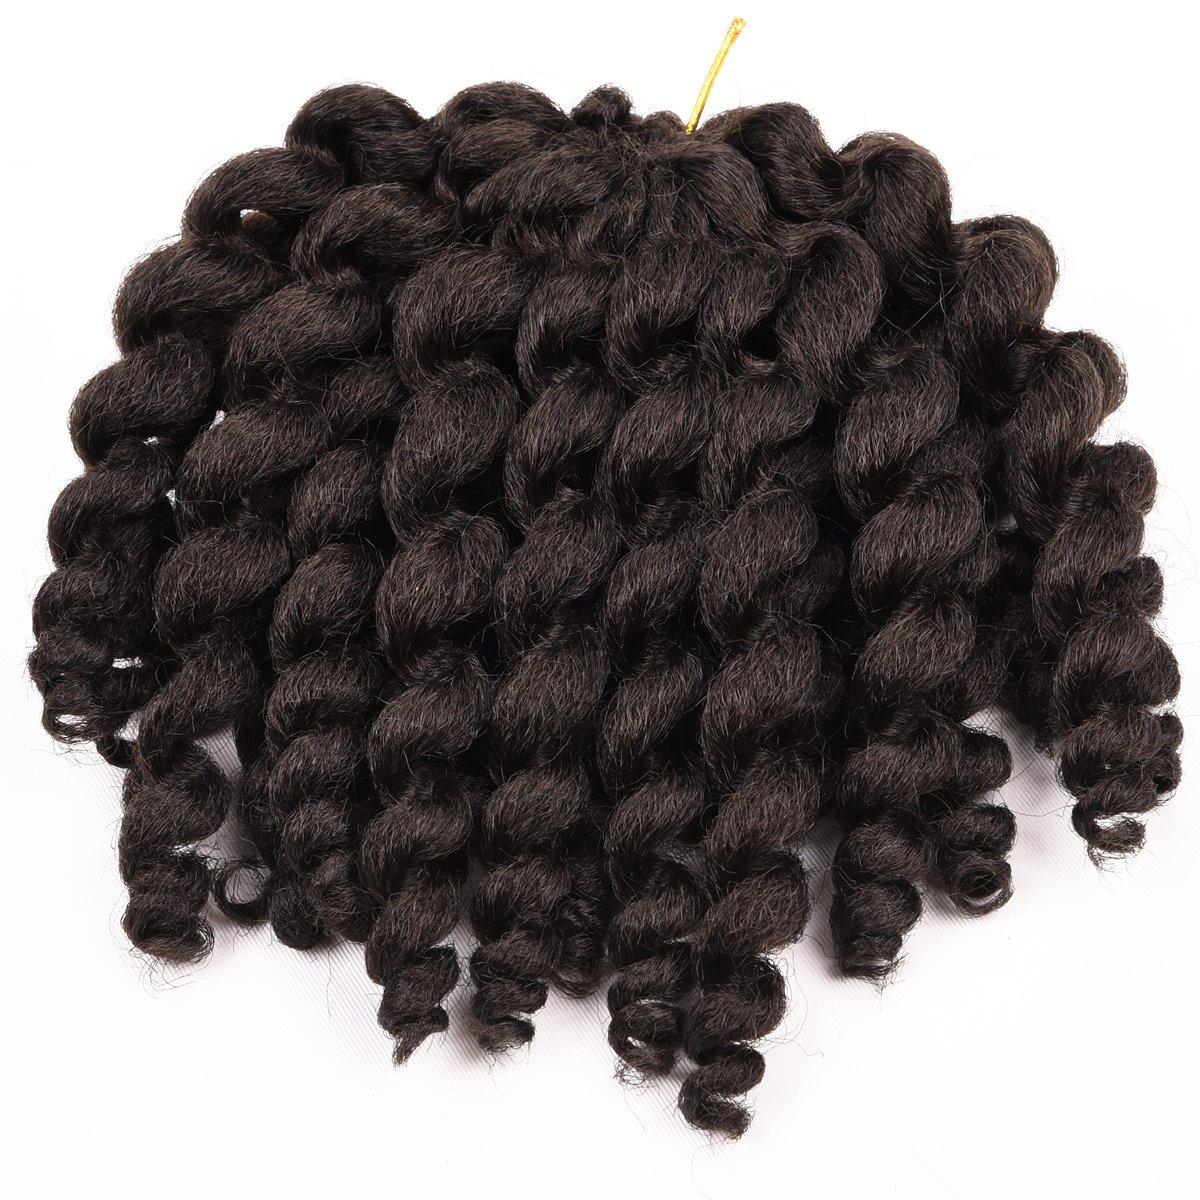 Silike JUMPY Wand Curl Crochet Hair (3 Pieces/Pack) Havana Mambo Crochet Braids Synthetic Hair For Women(4#)